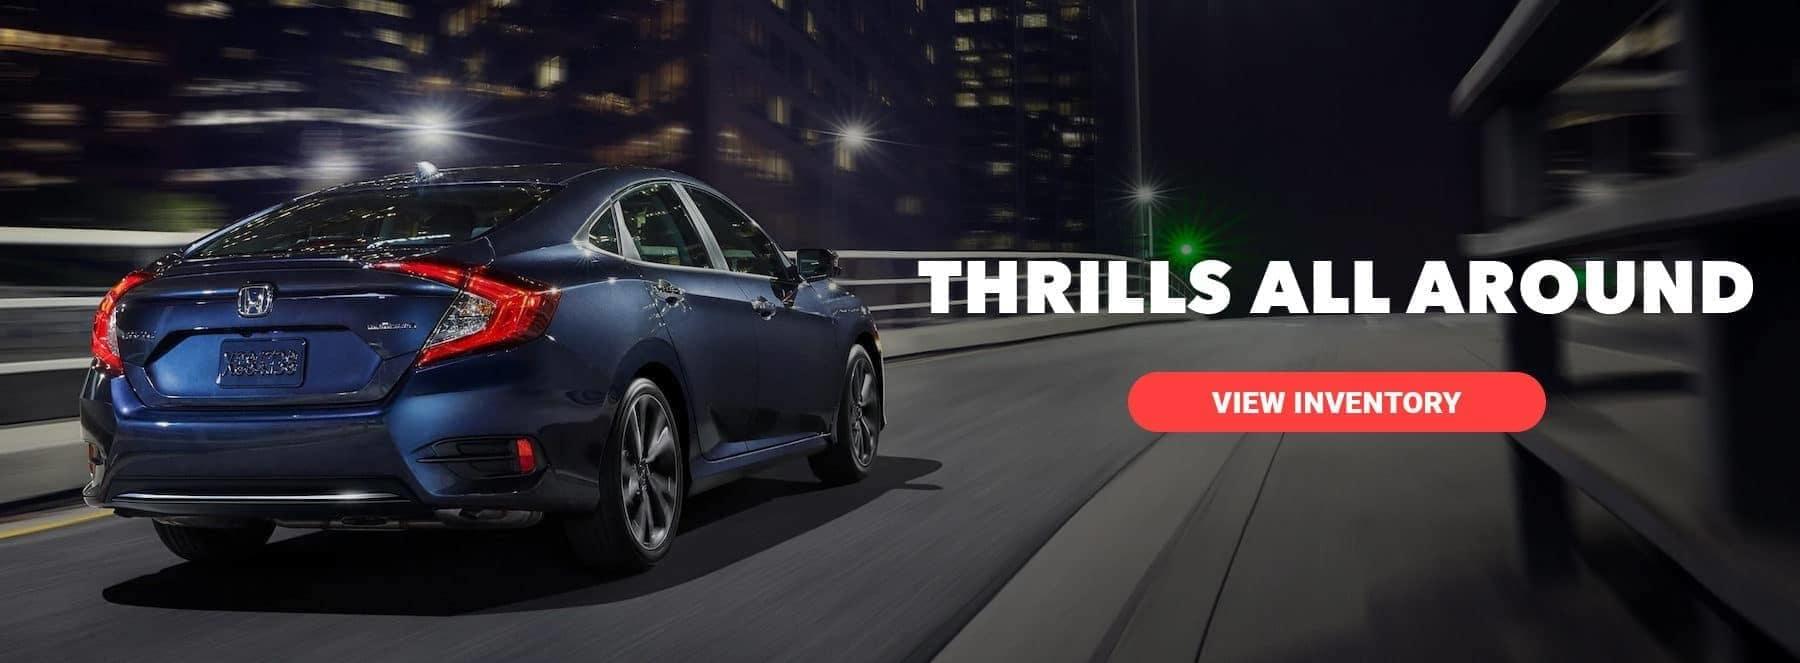 thrills all around, links to civic vehicle page